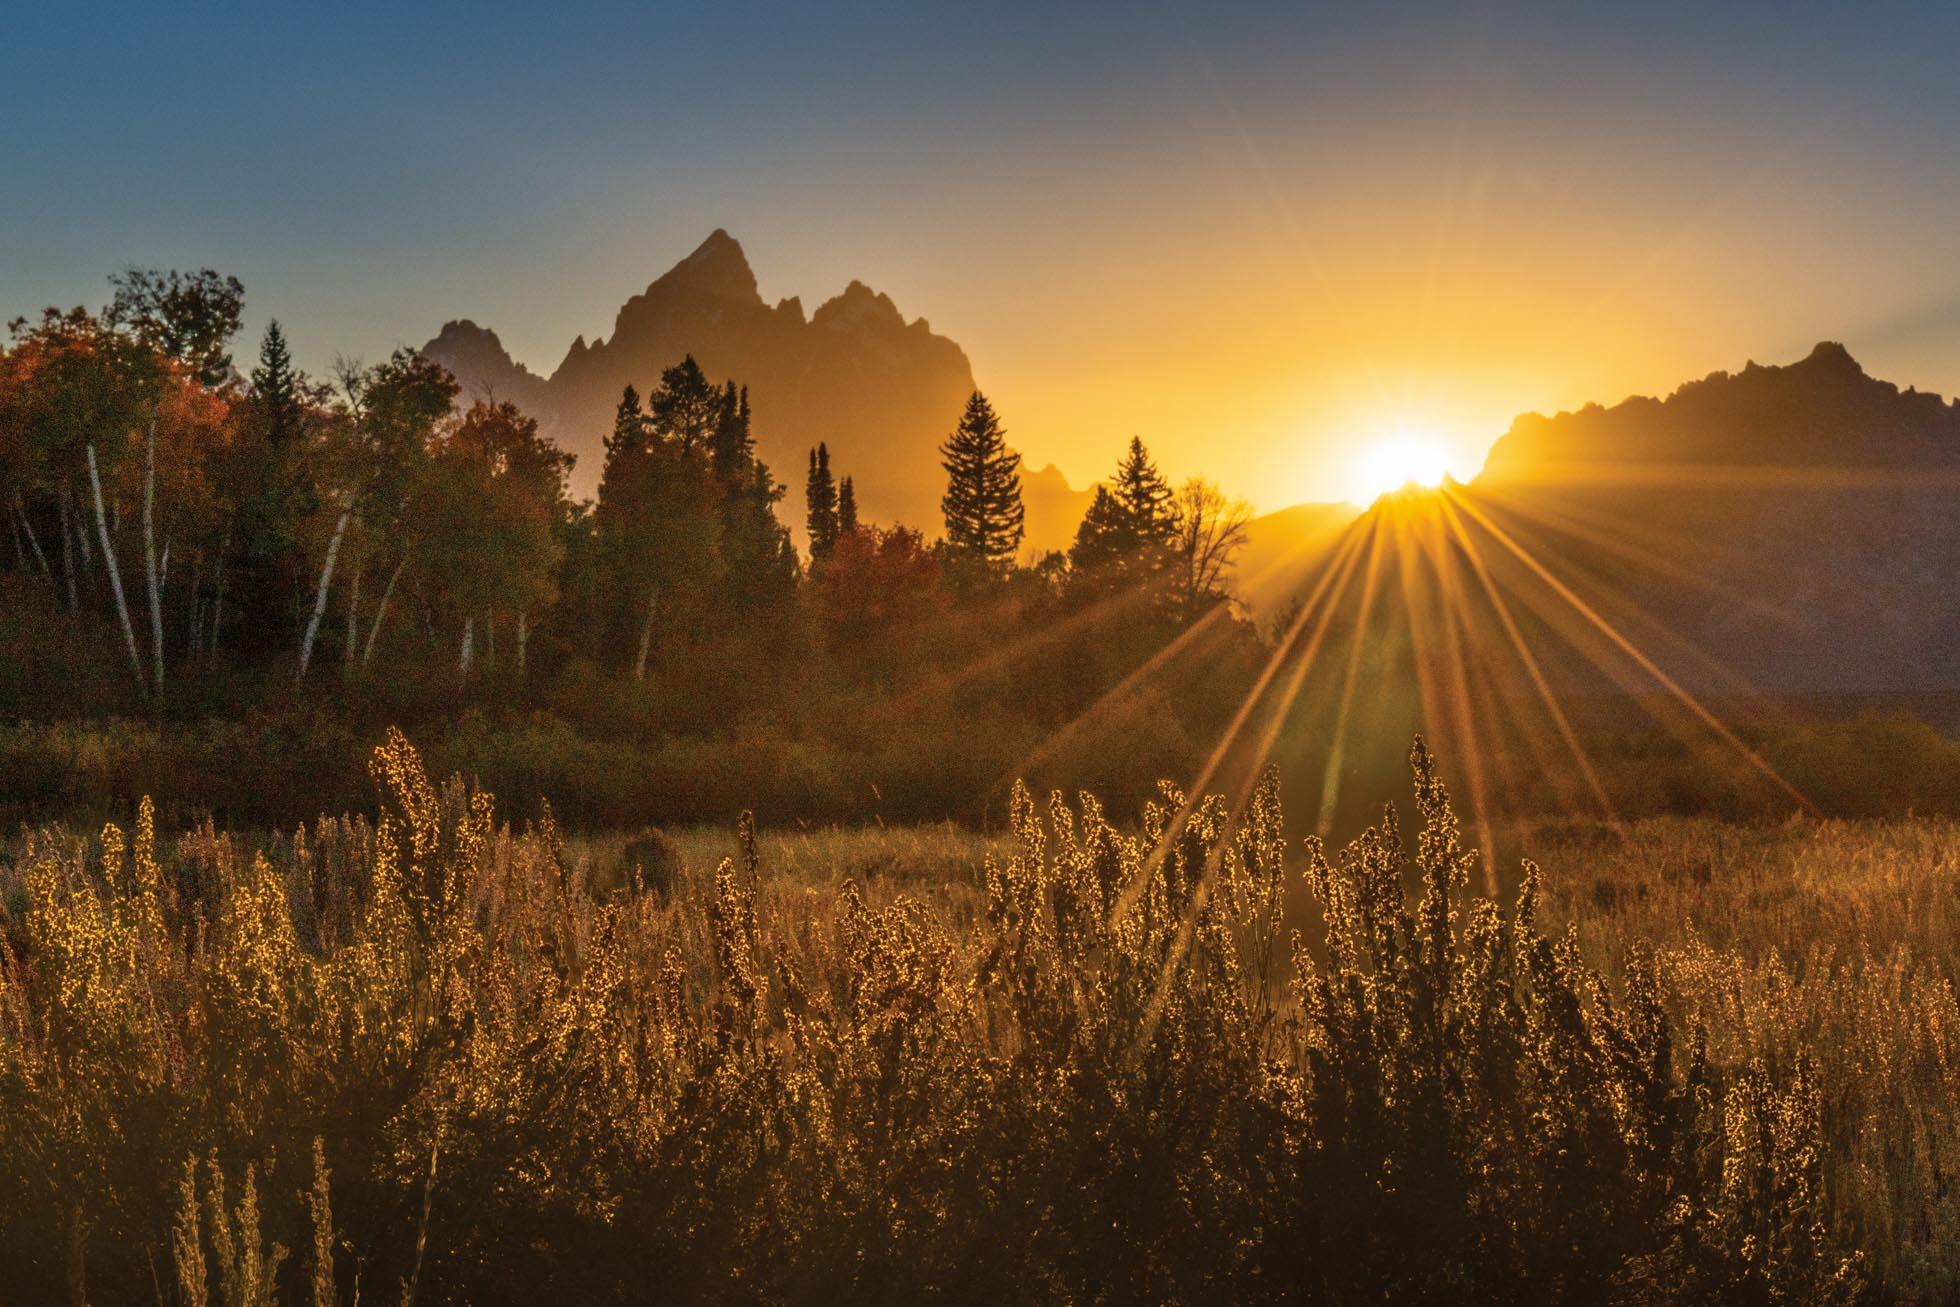 Teton golden sunset tighter crop_.jpg